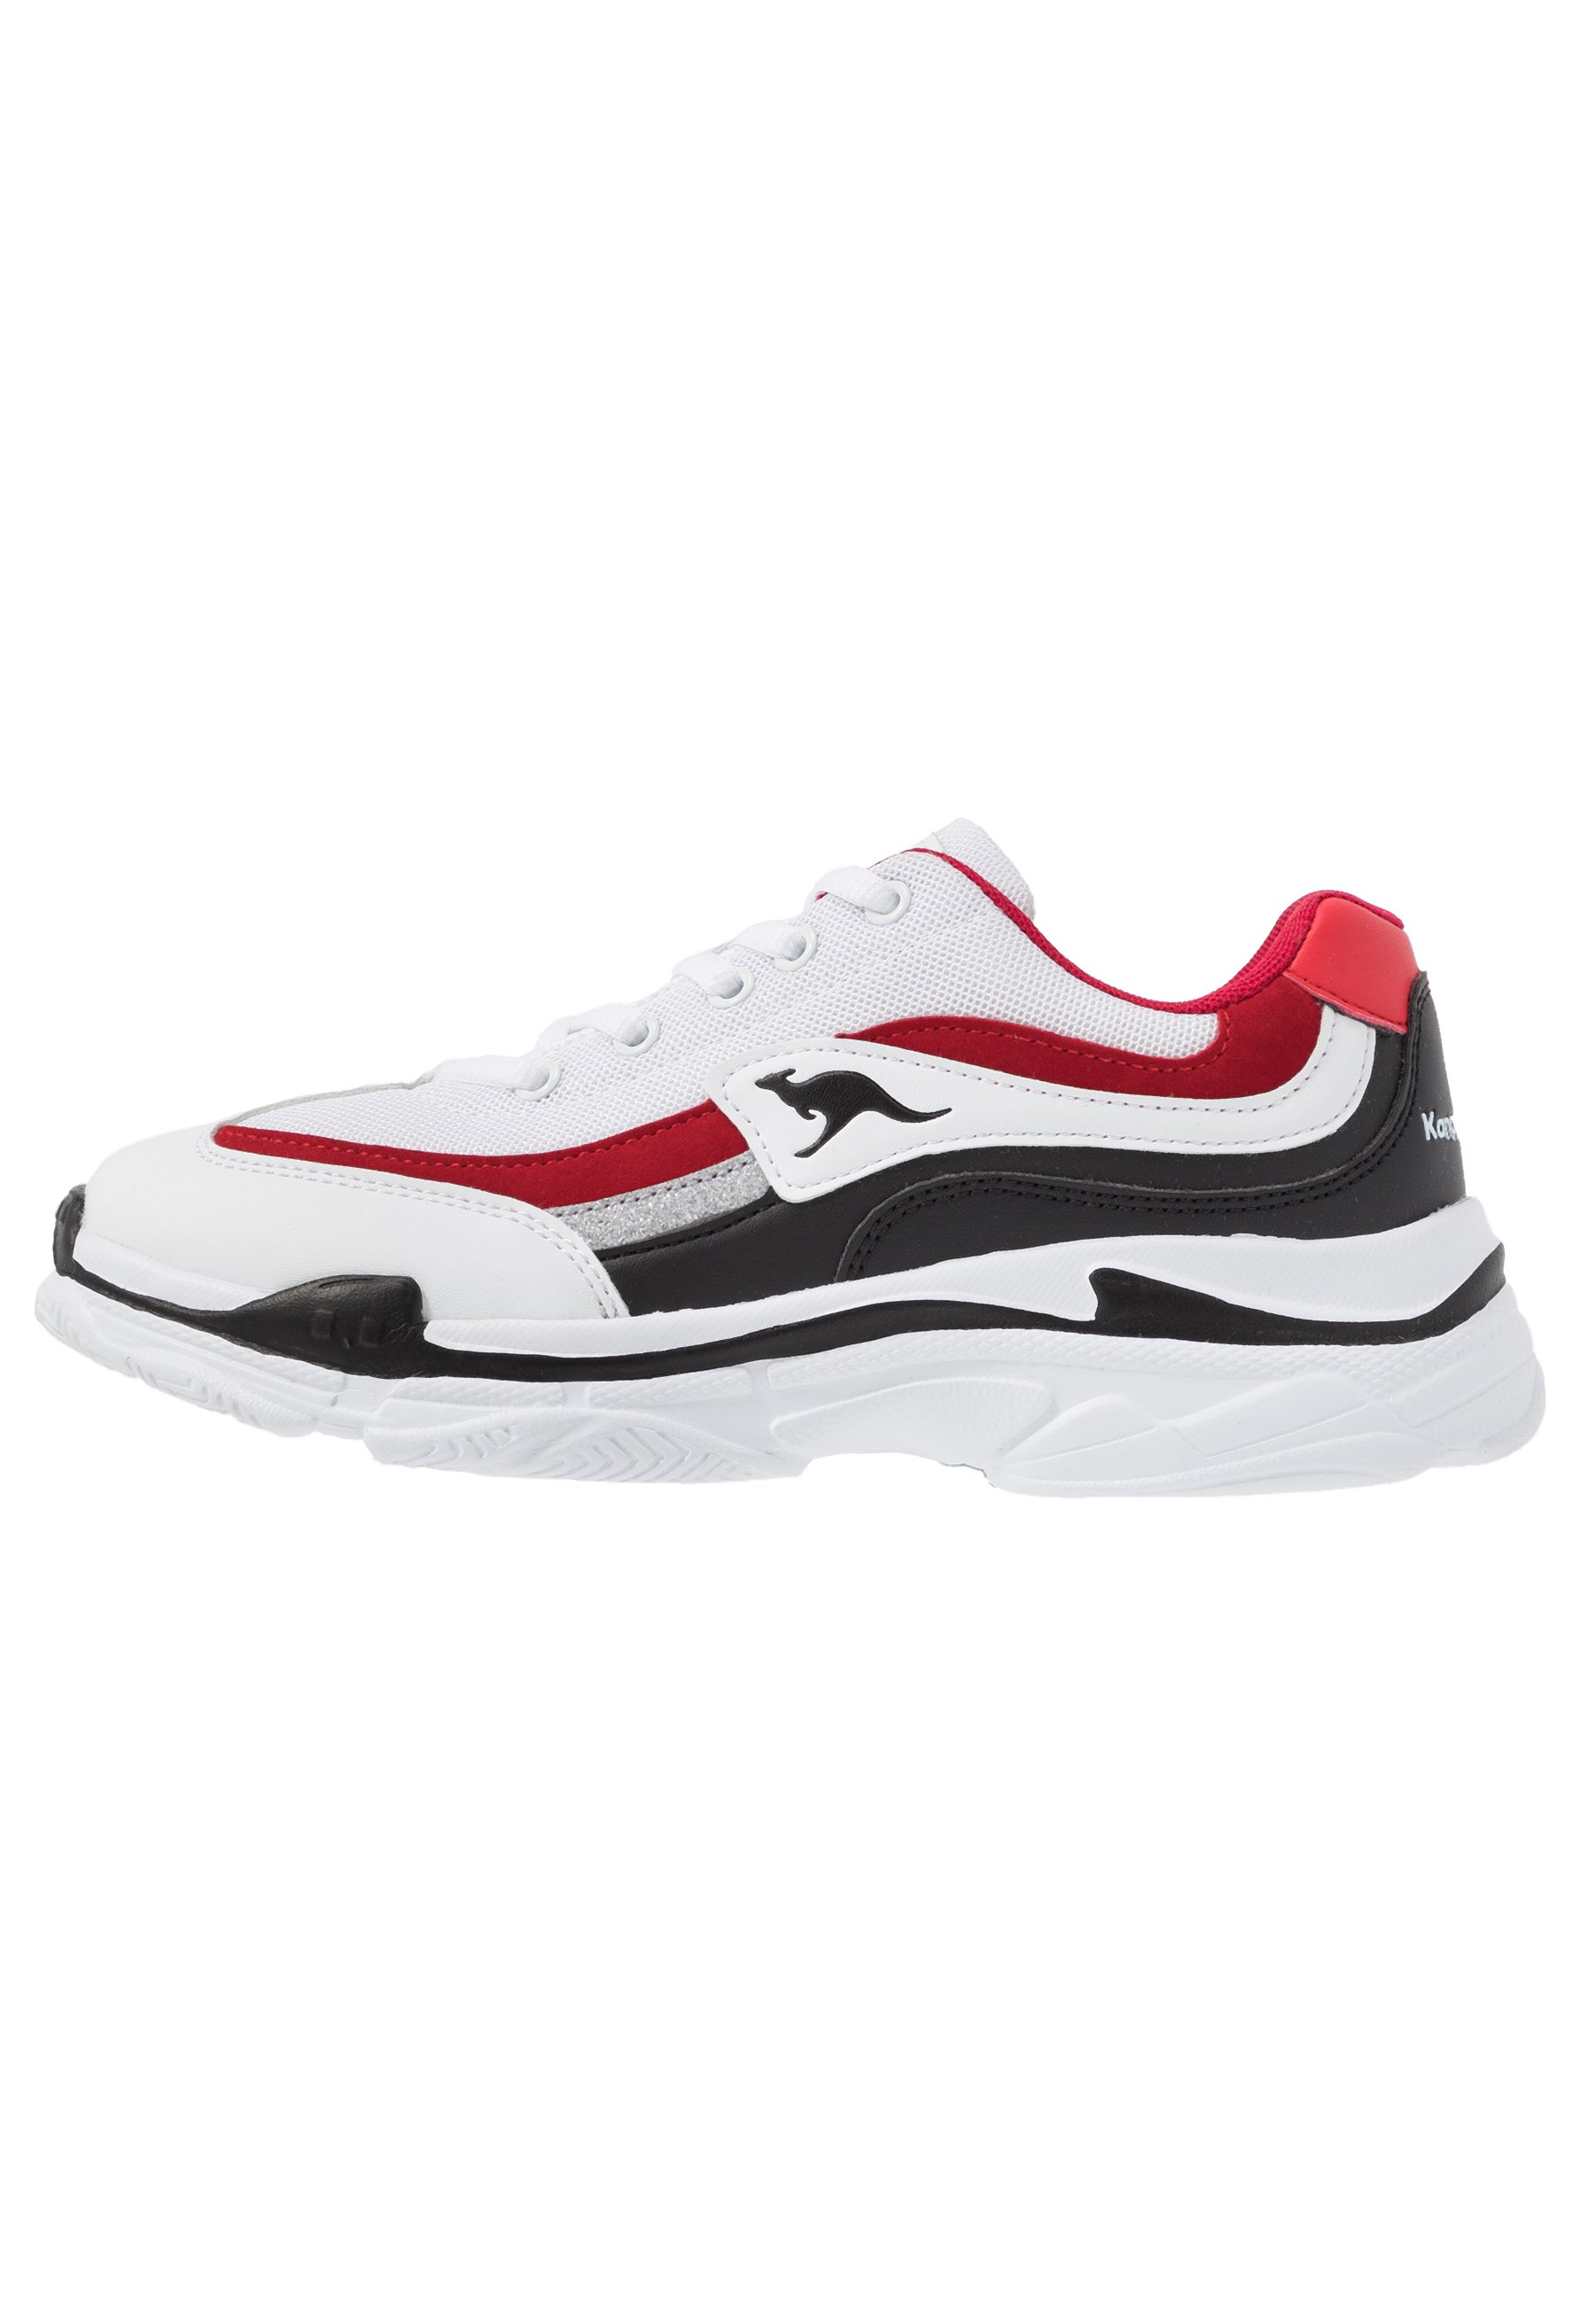 Kangaroos Rave - Sneakers Basse White/red qRgHg